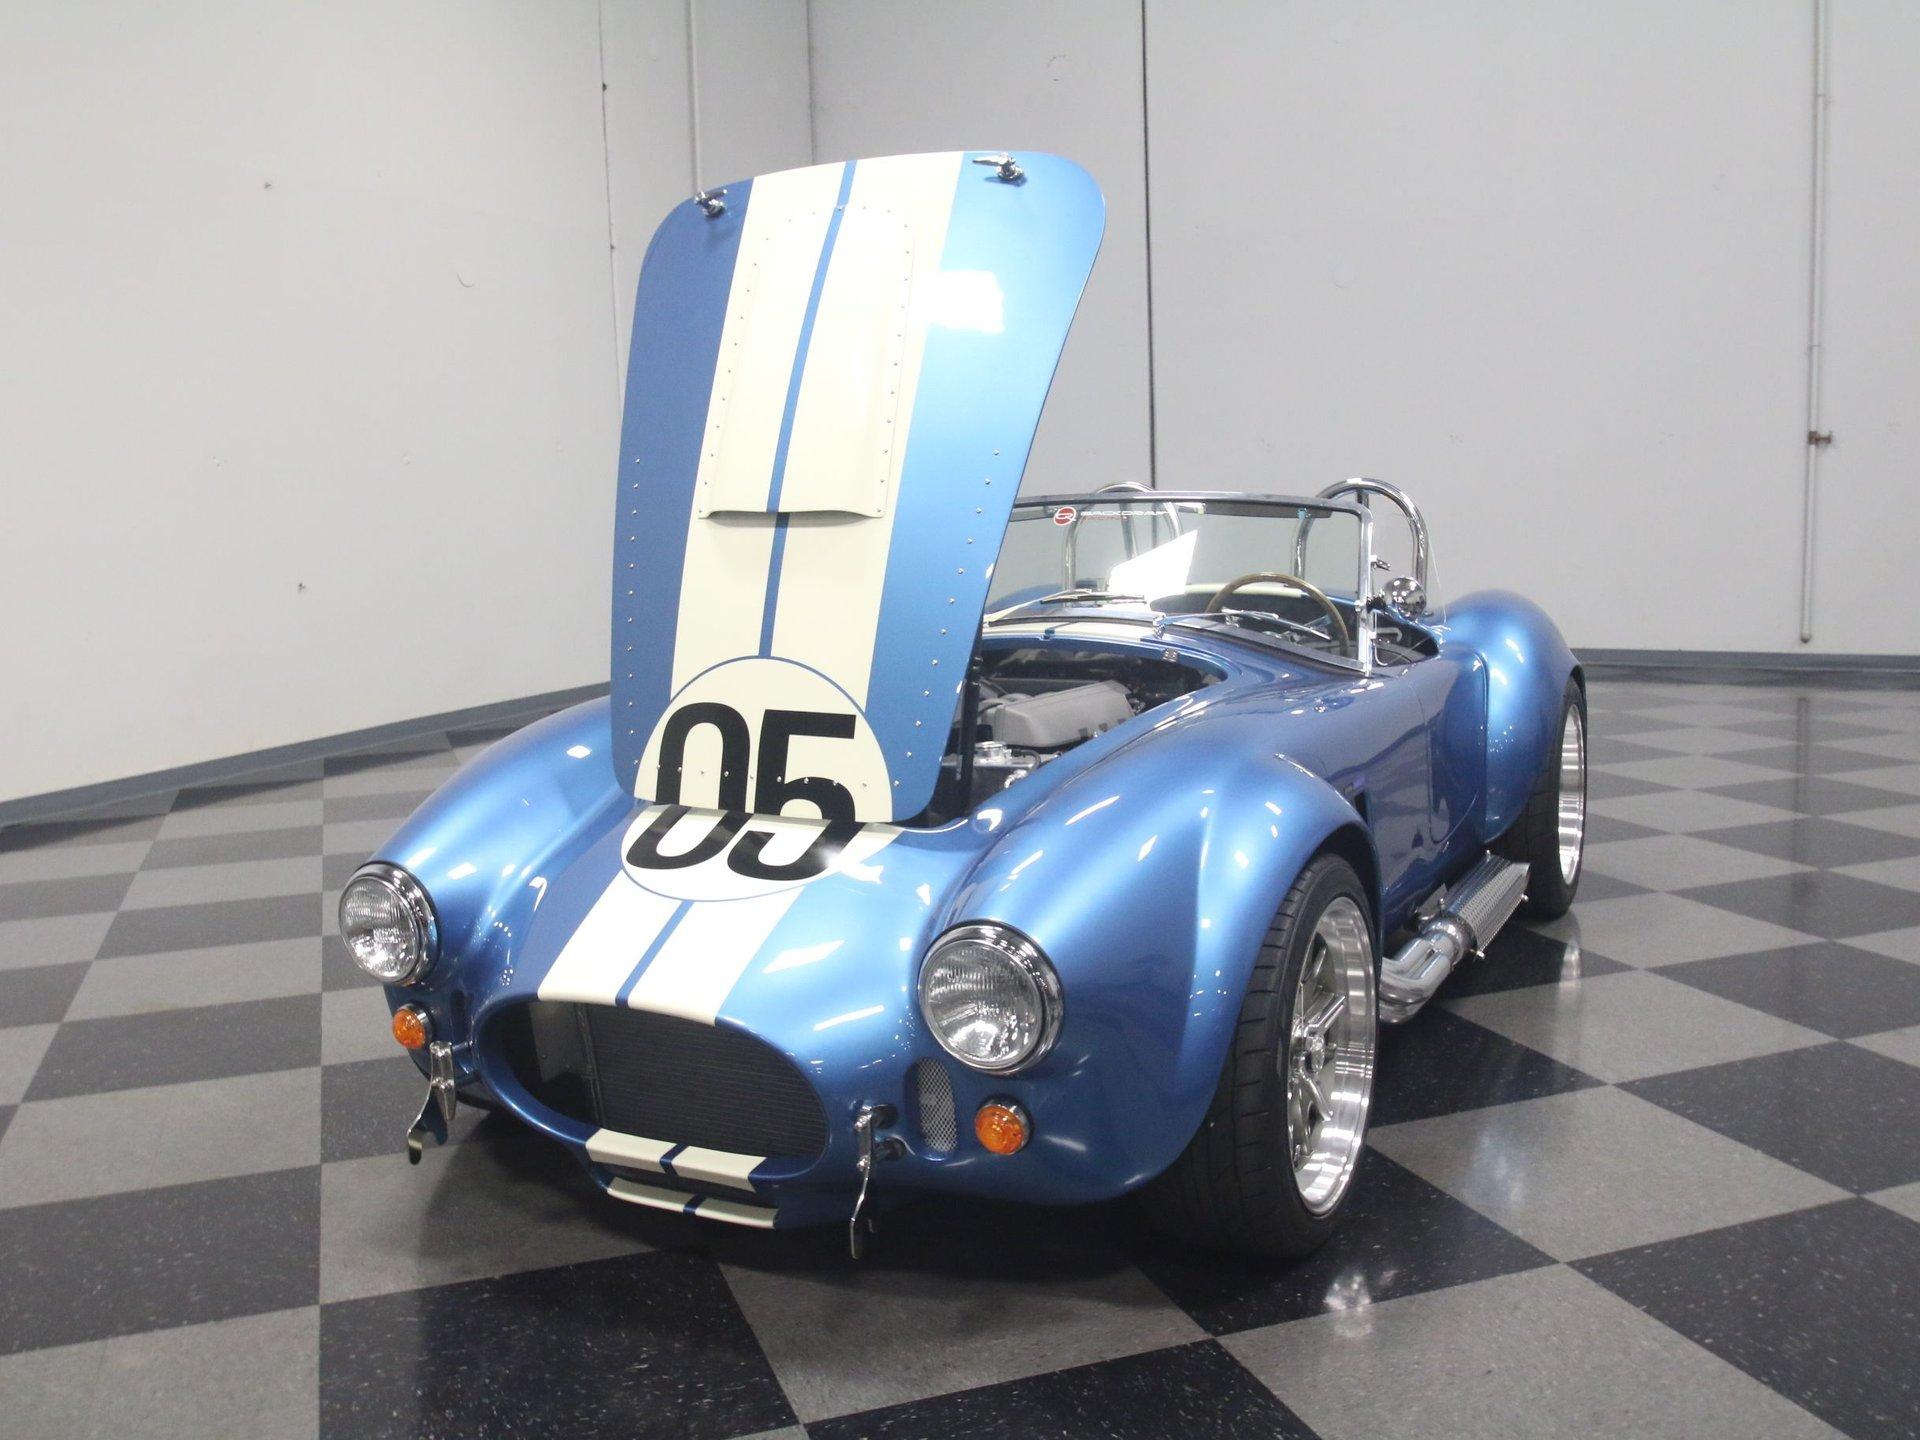 1965 Shelby Cobra | Streetside Classics - The Nation's Trusted